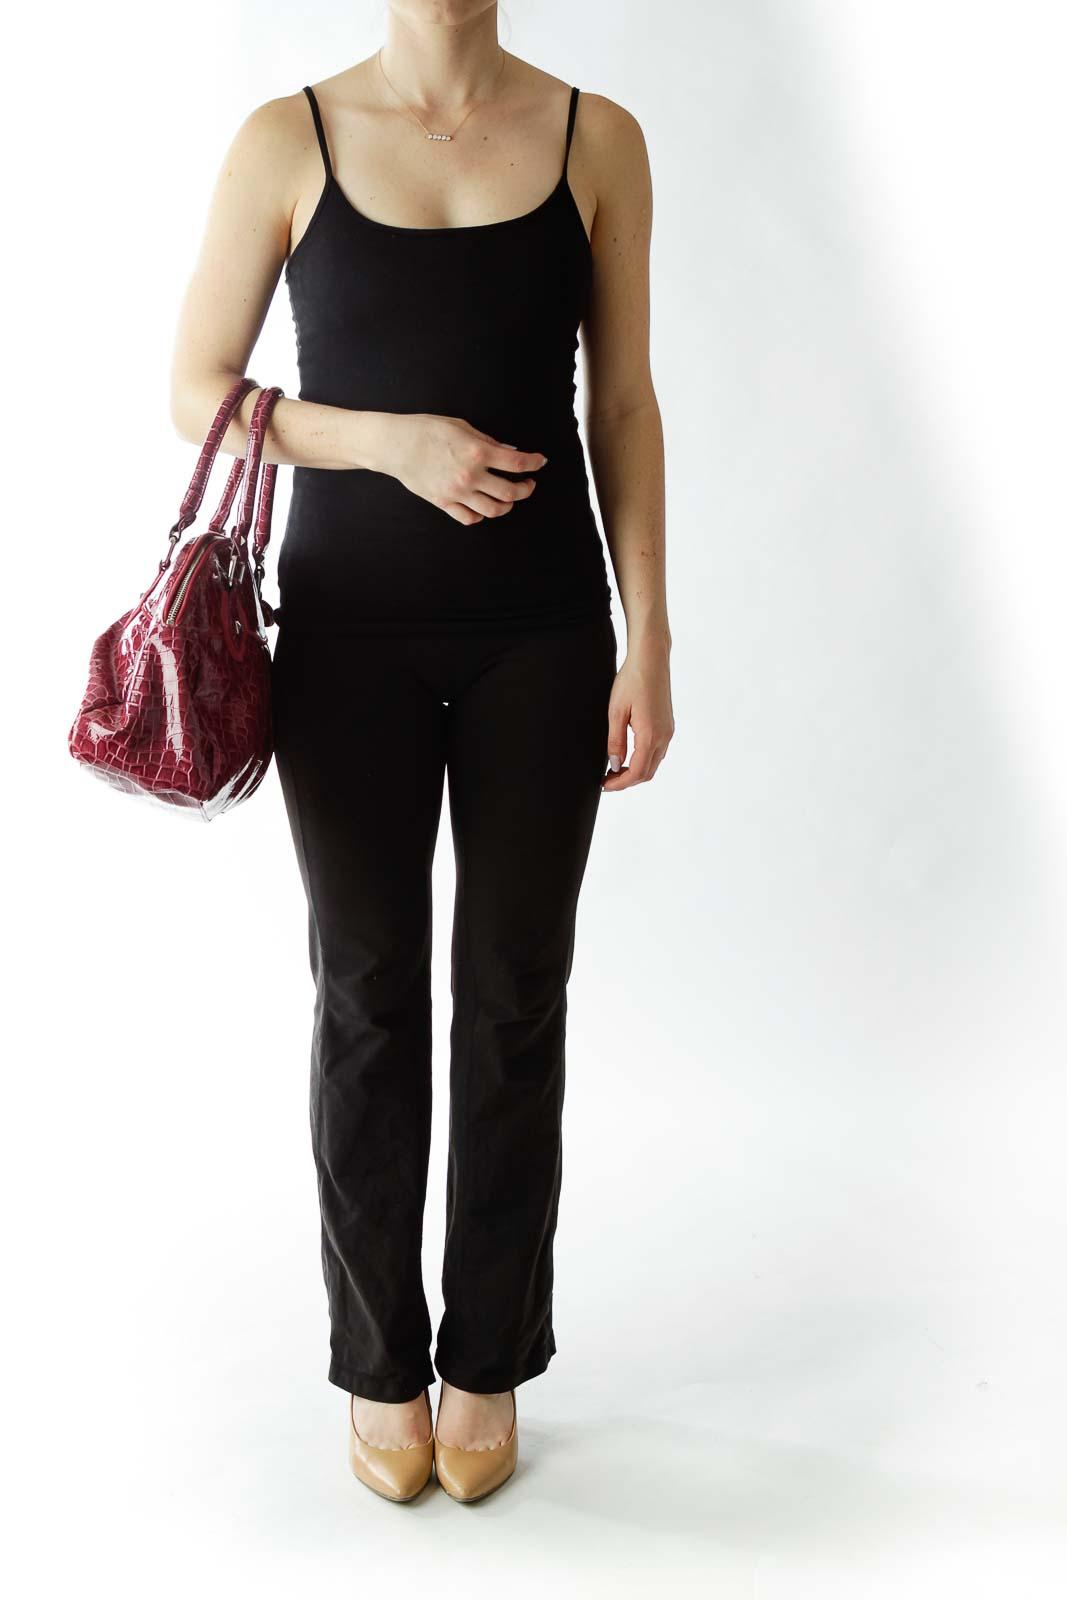 702969f8e47d9 Shop Burgundy Alligator Bag clothing and handbags at SilkRoll. Trade ...